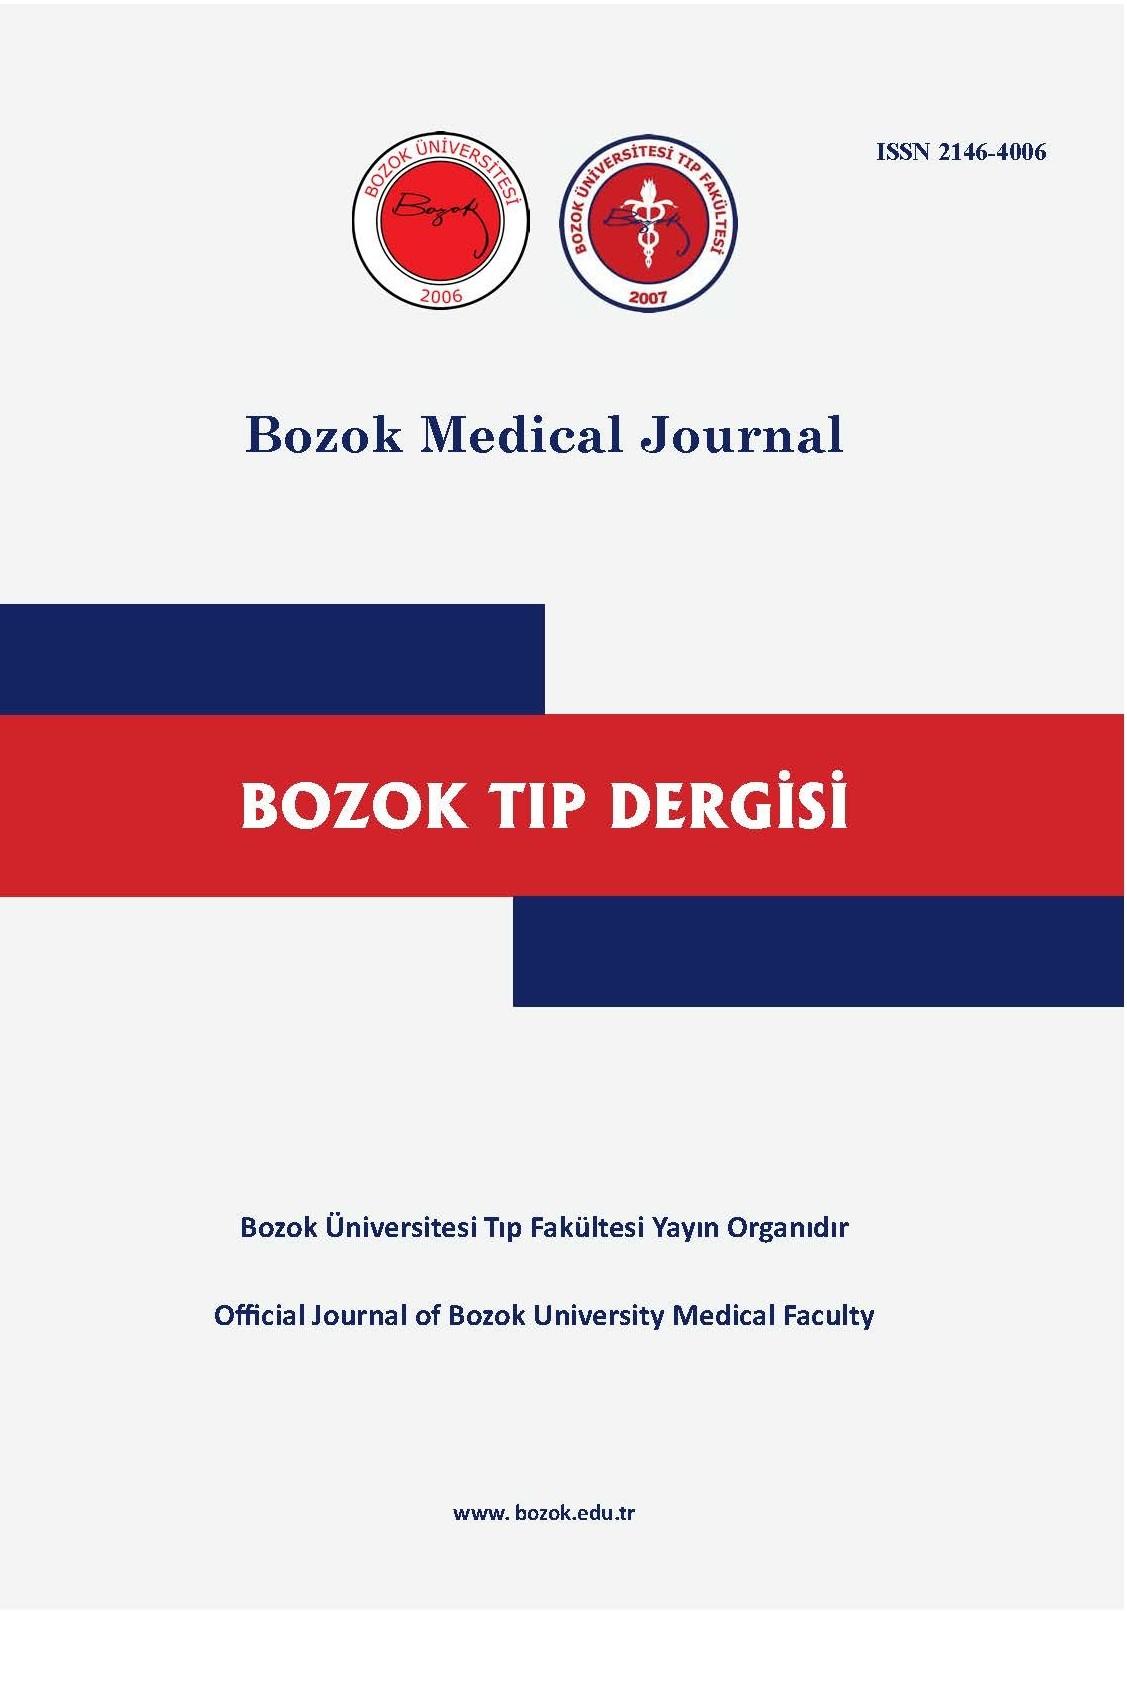 Bozok Tıp Dergisi